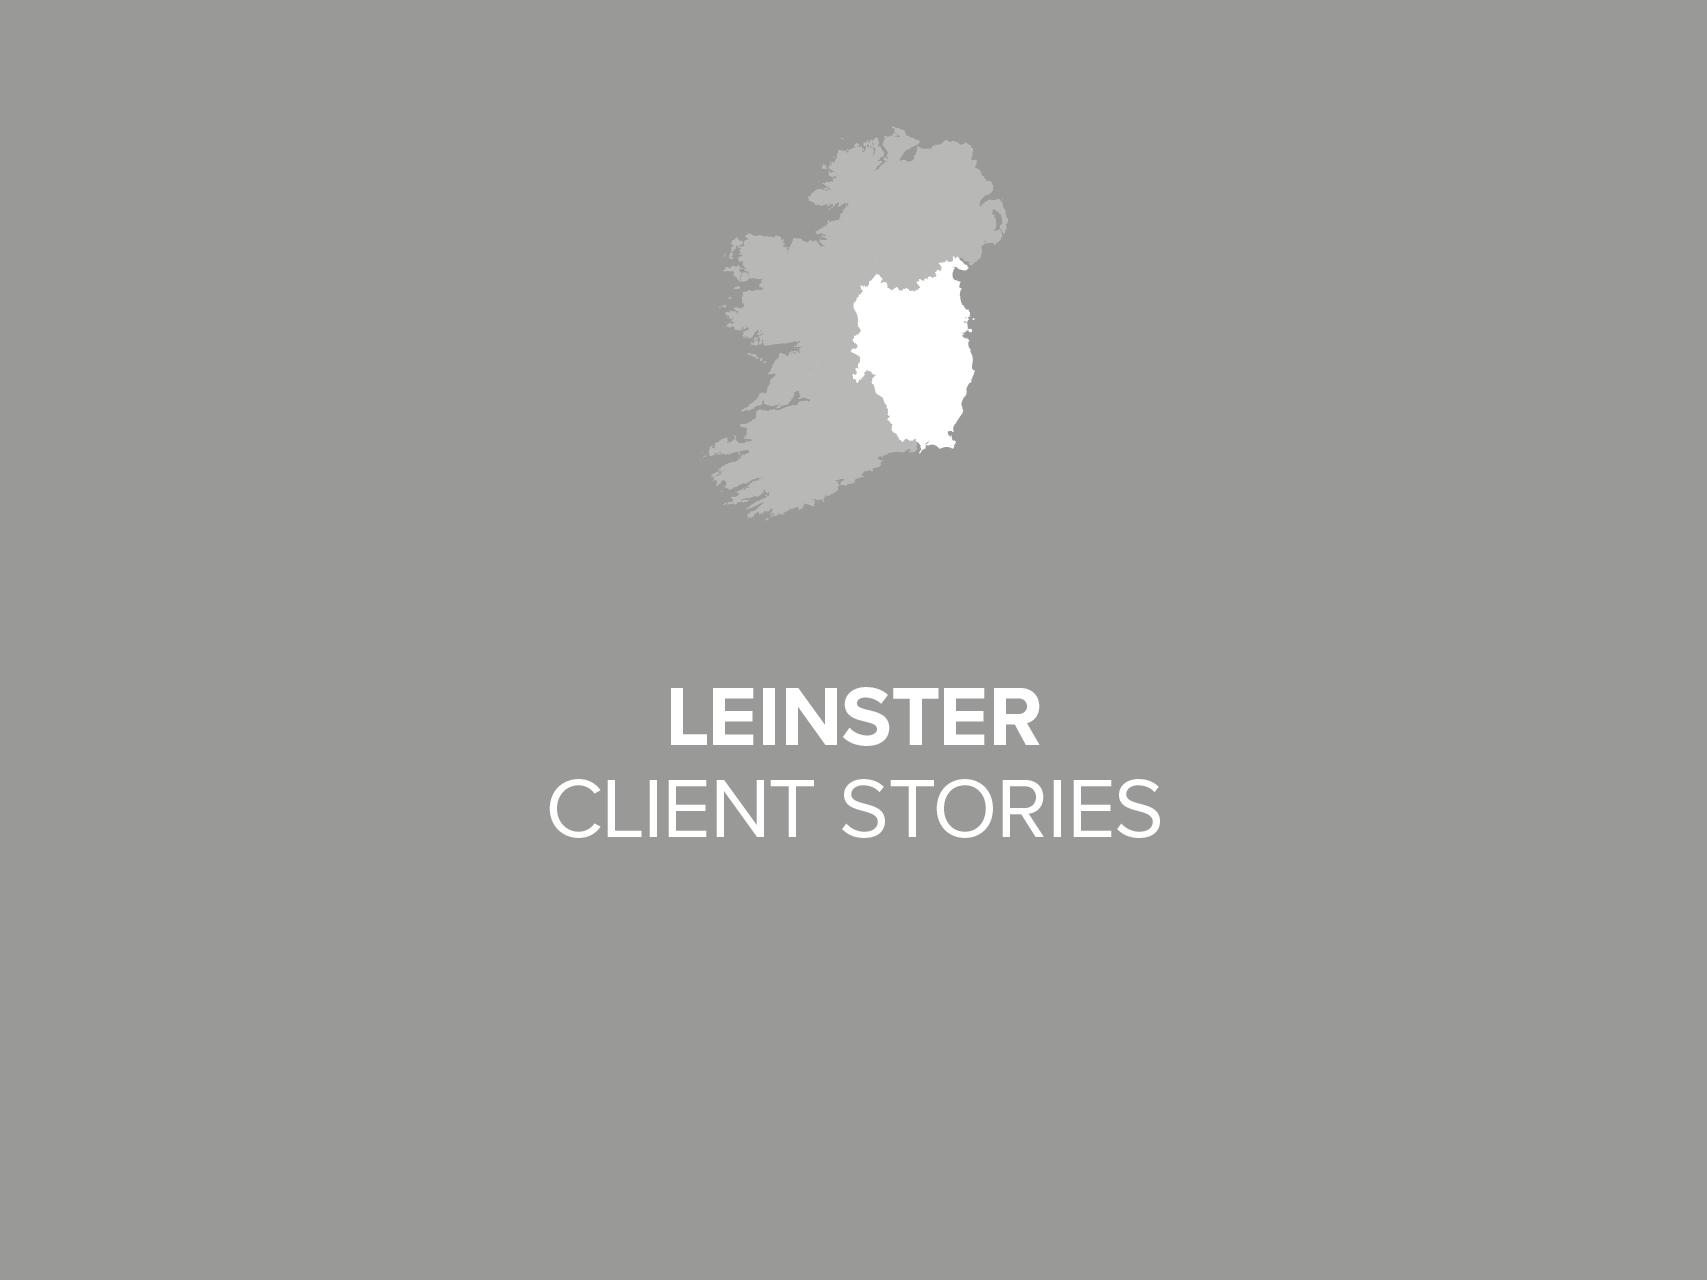 Leinster Client Stories